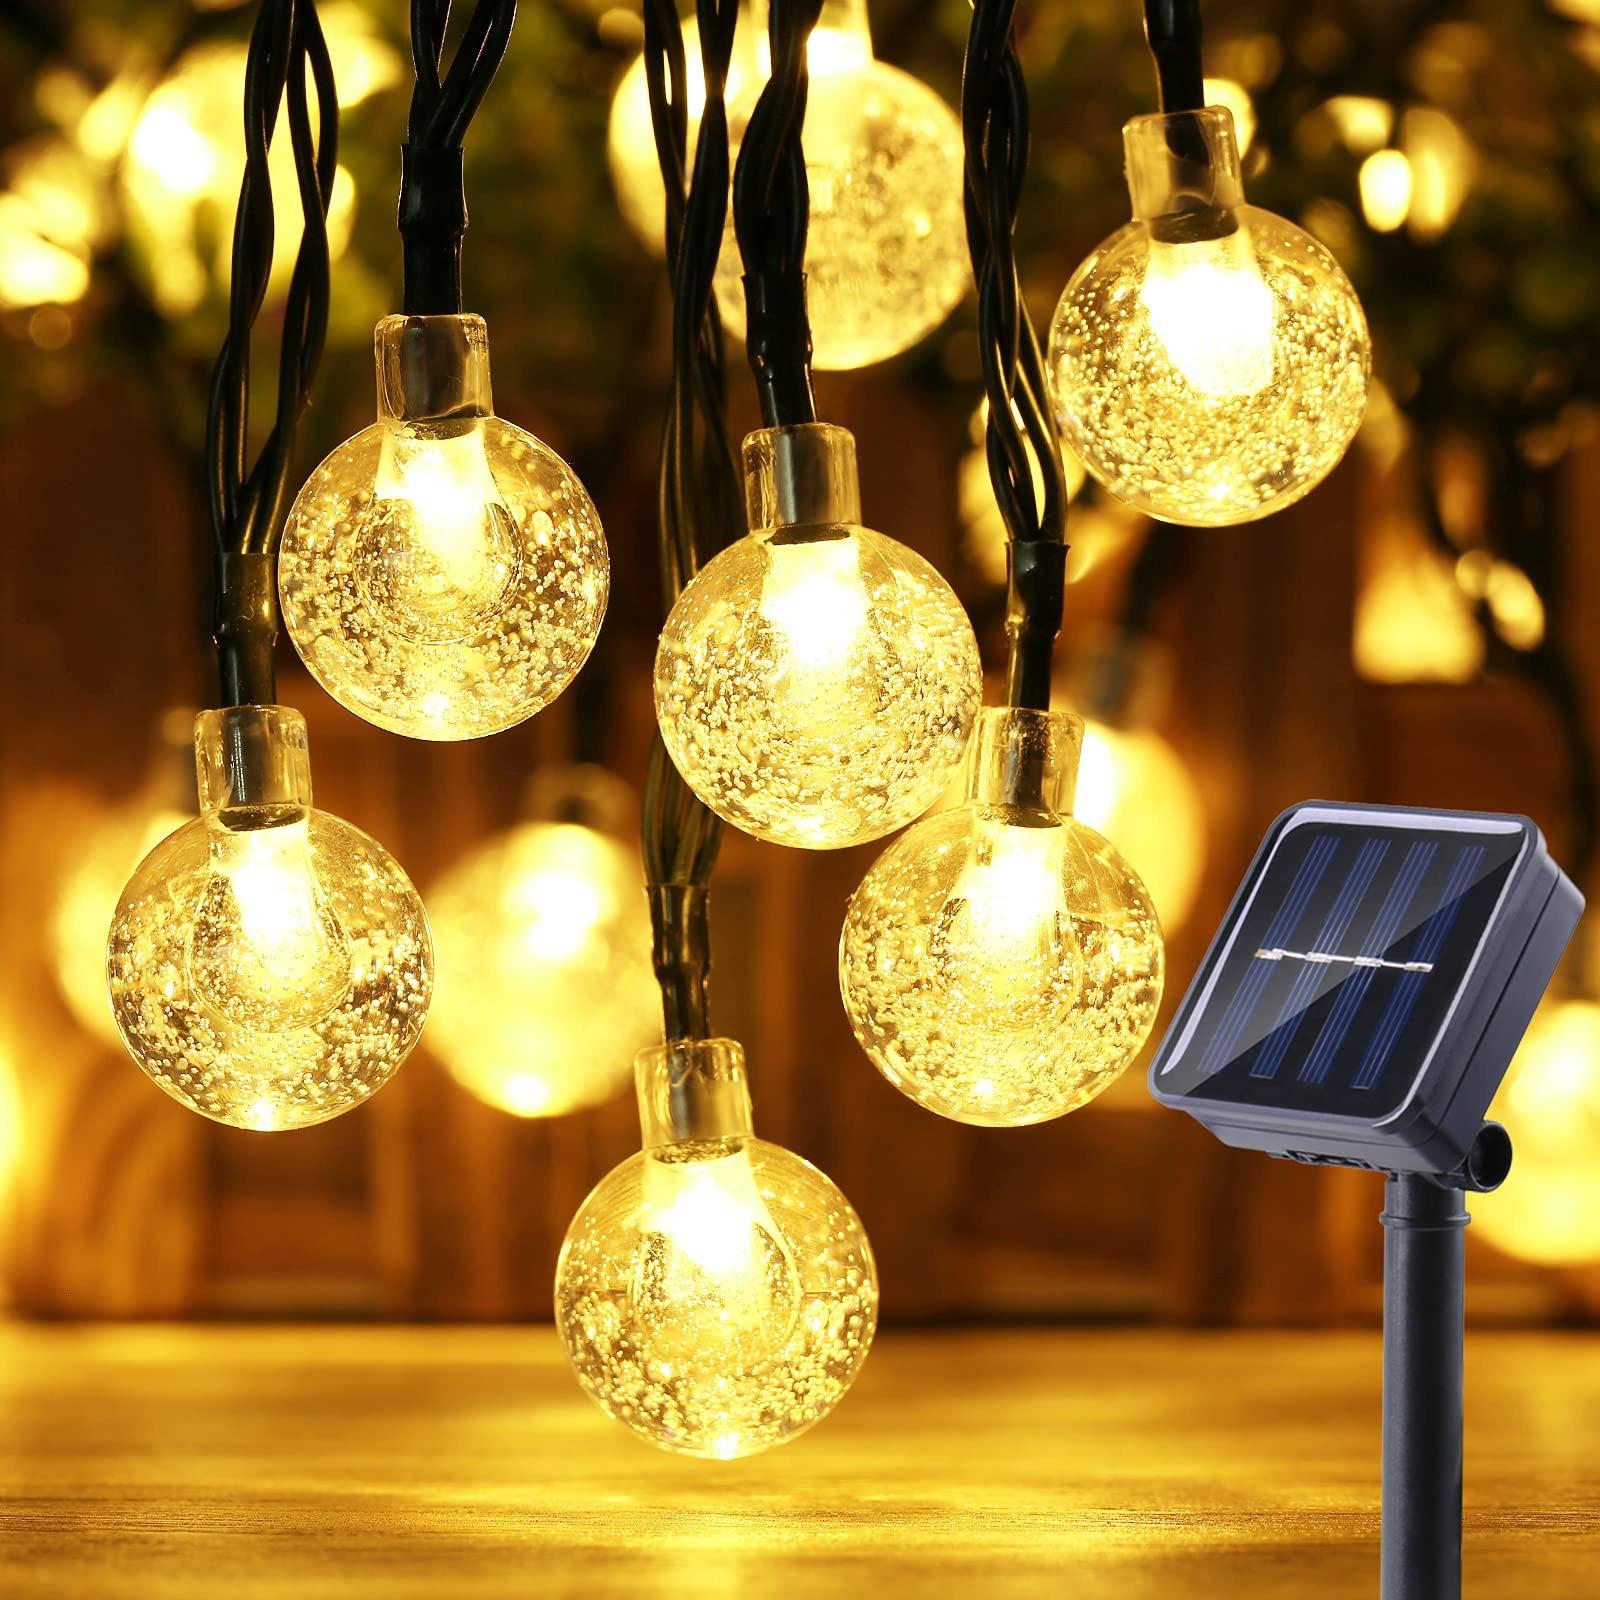 20/30/50 LEDS Crystal ball 5M/10M Solar Lamp Power LED String Fairy Lights Solar Garlands Garden Christmas Decor For Outdoor